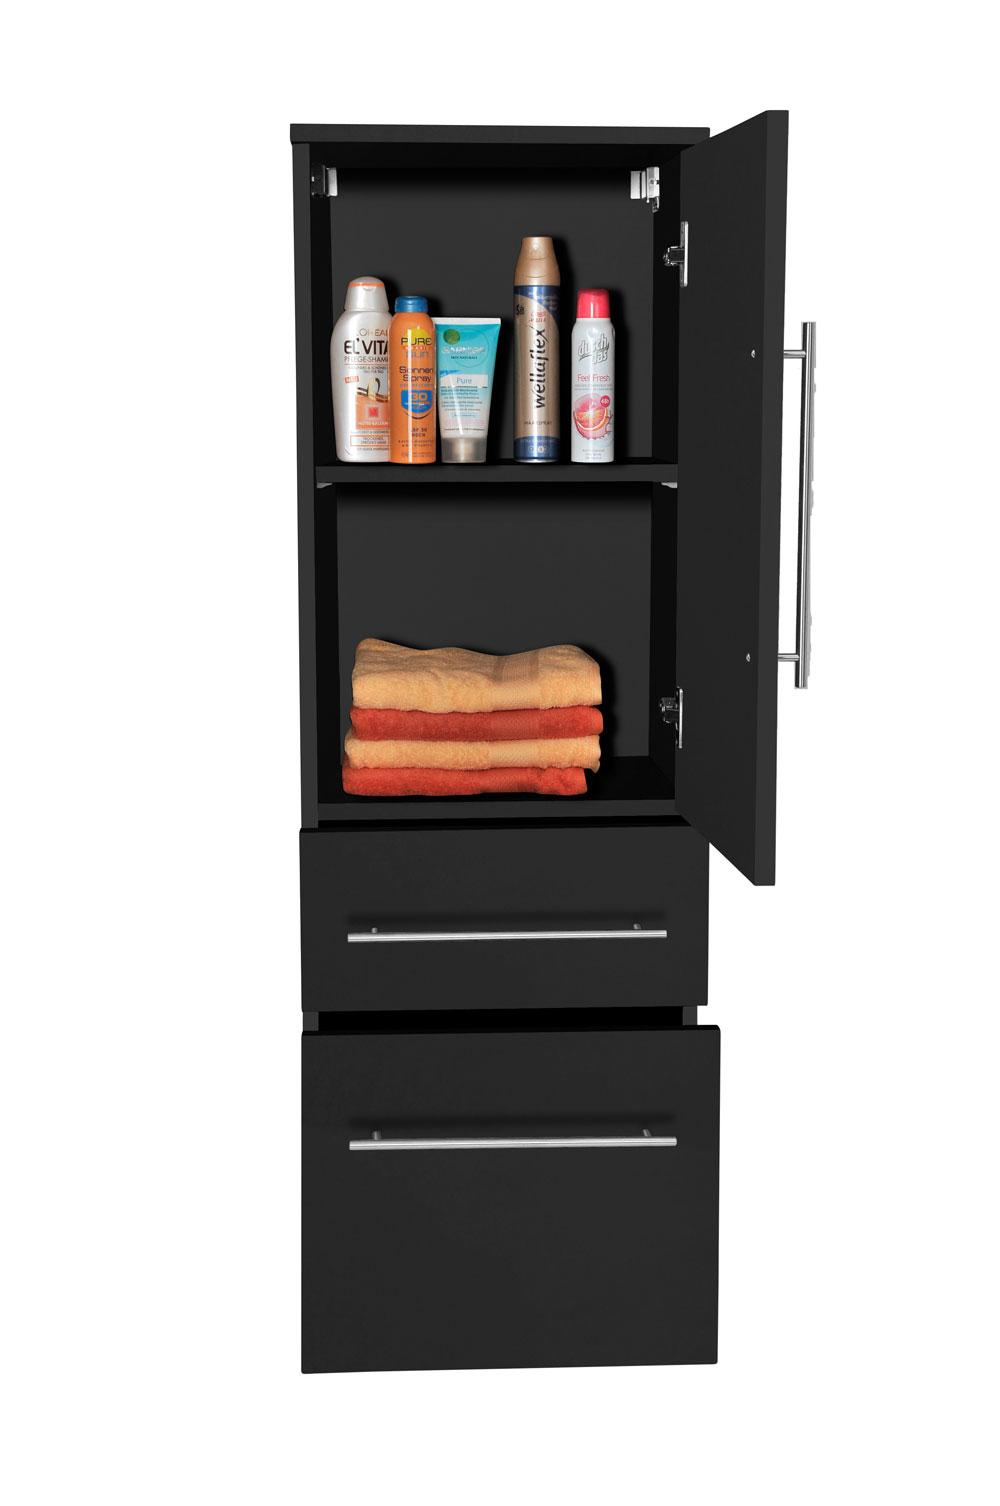 sam 5tlg badezimmer set spiegelschrank schwarz 80 cm verena auf lager. Black Bedroom Furniture Sets. Home Design Ideas